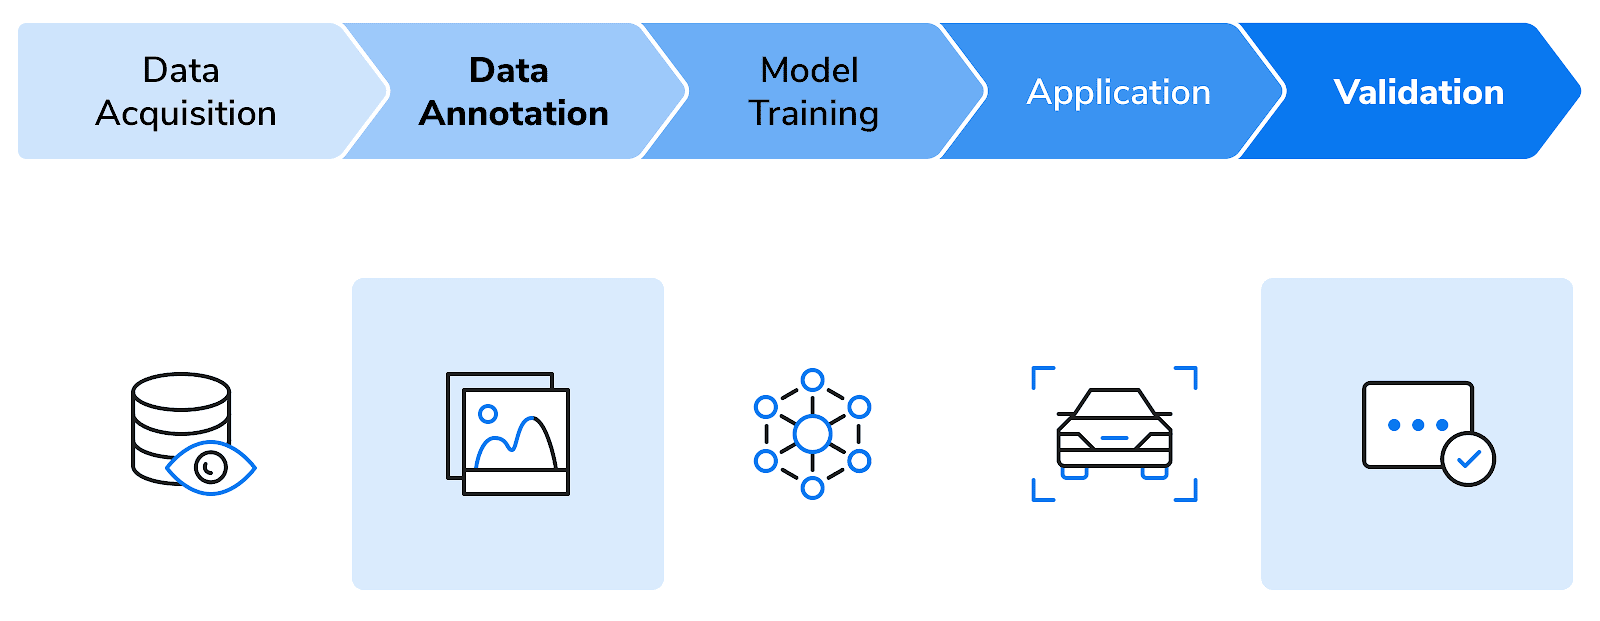 UAI data processing pipeline